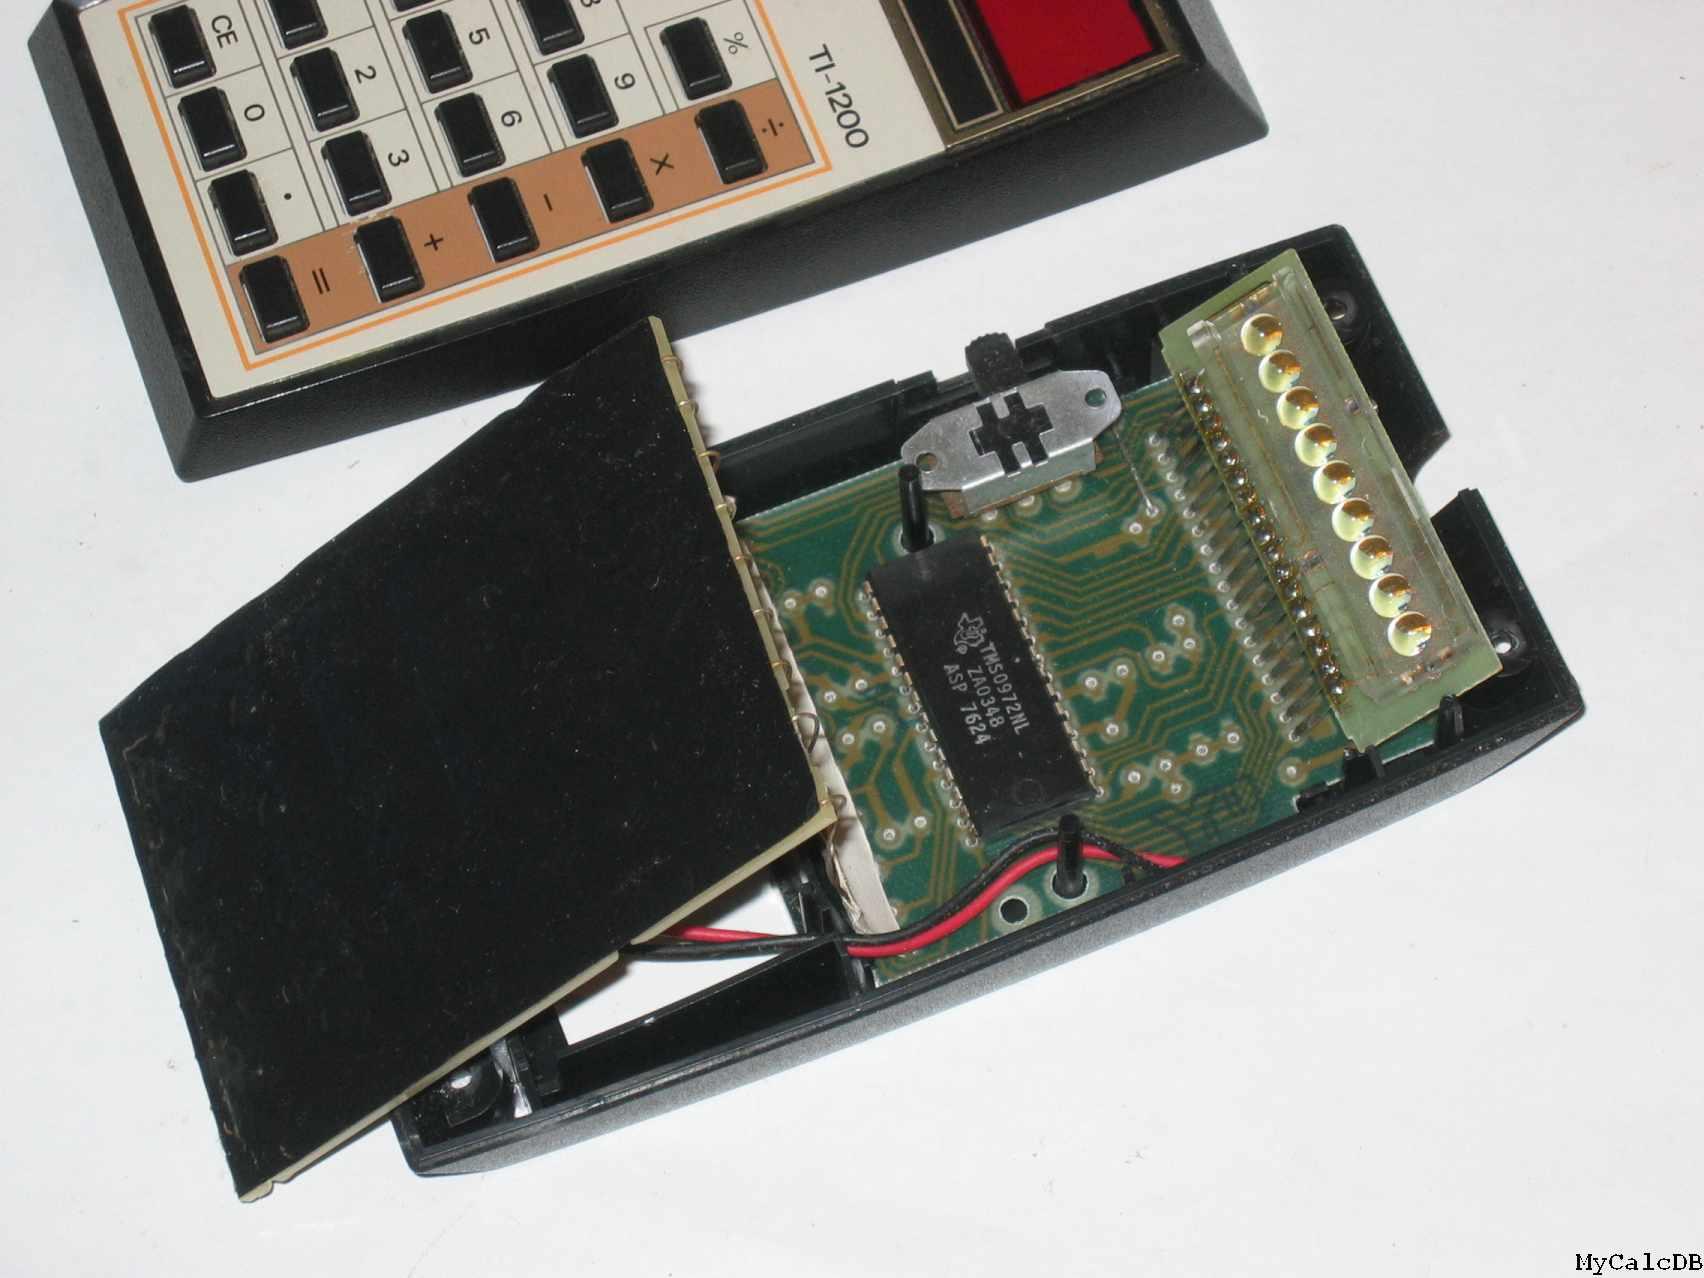 texas insturument t1-1200 calculator